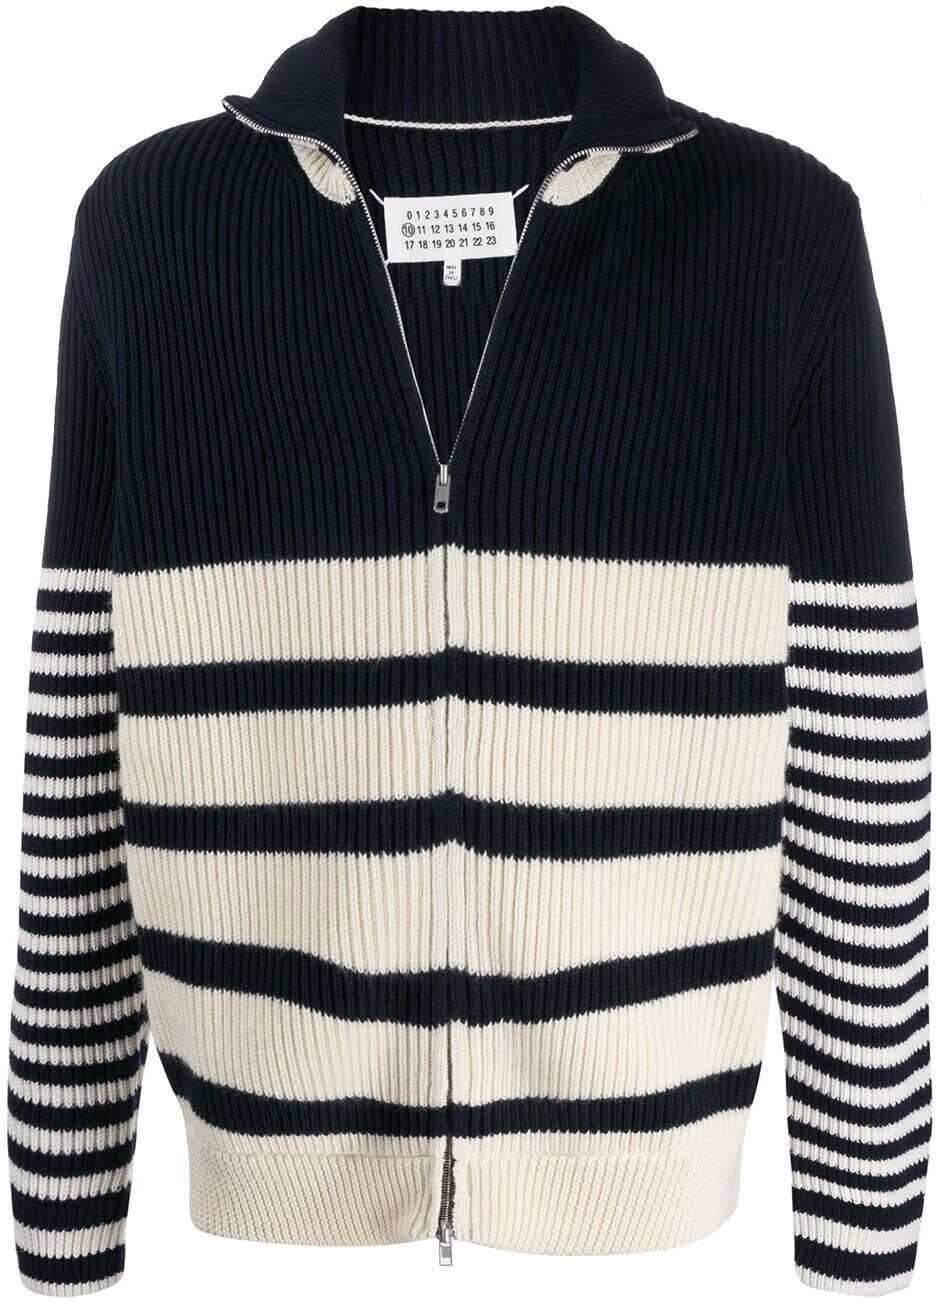 Maison Margiela Wool Sweater MULTICOLOR